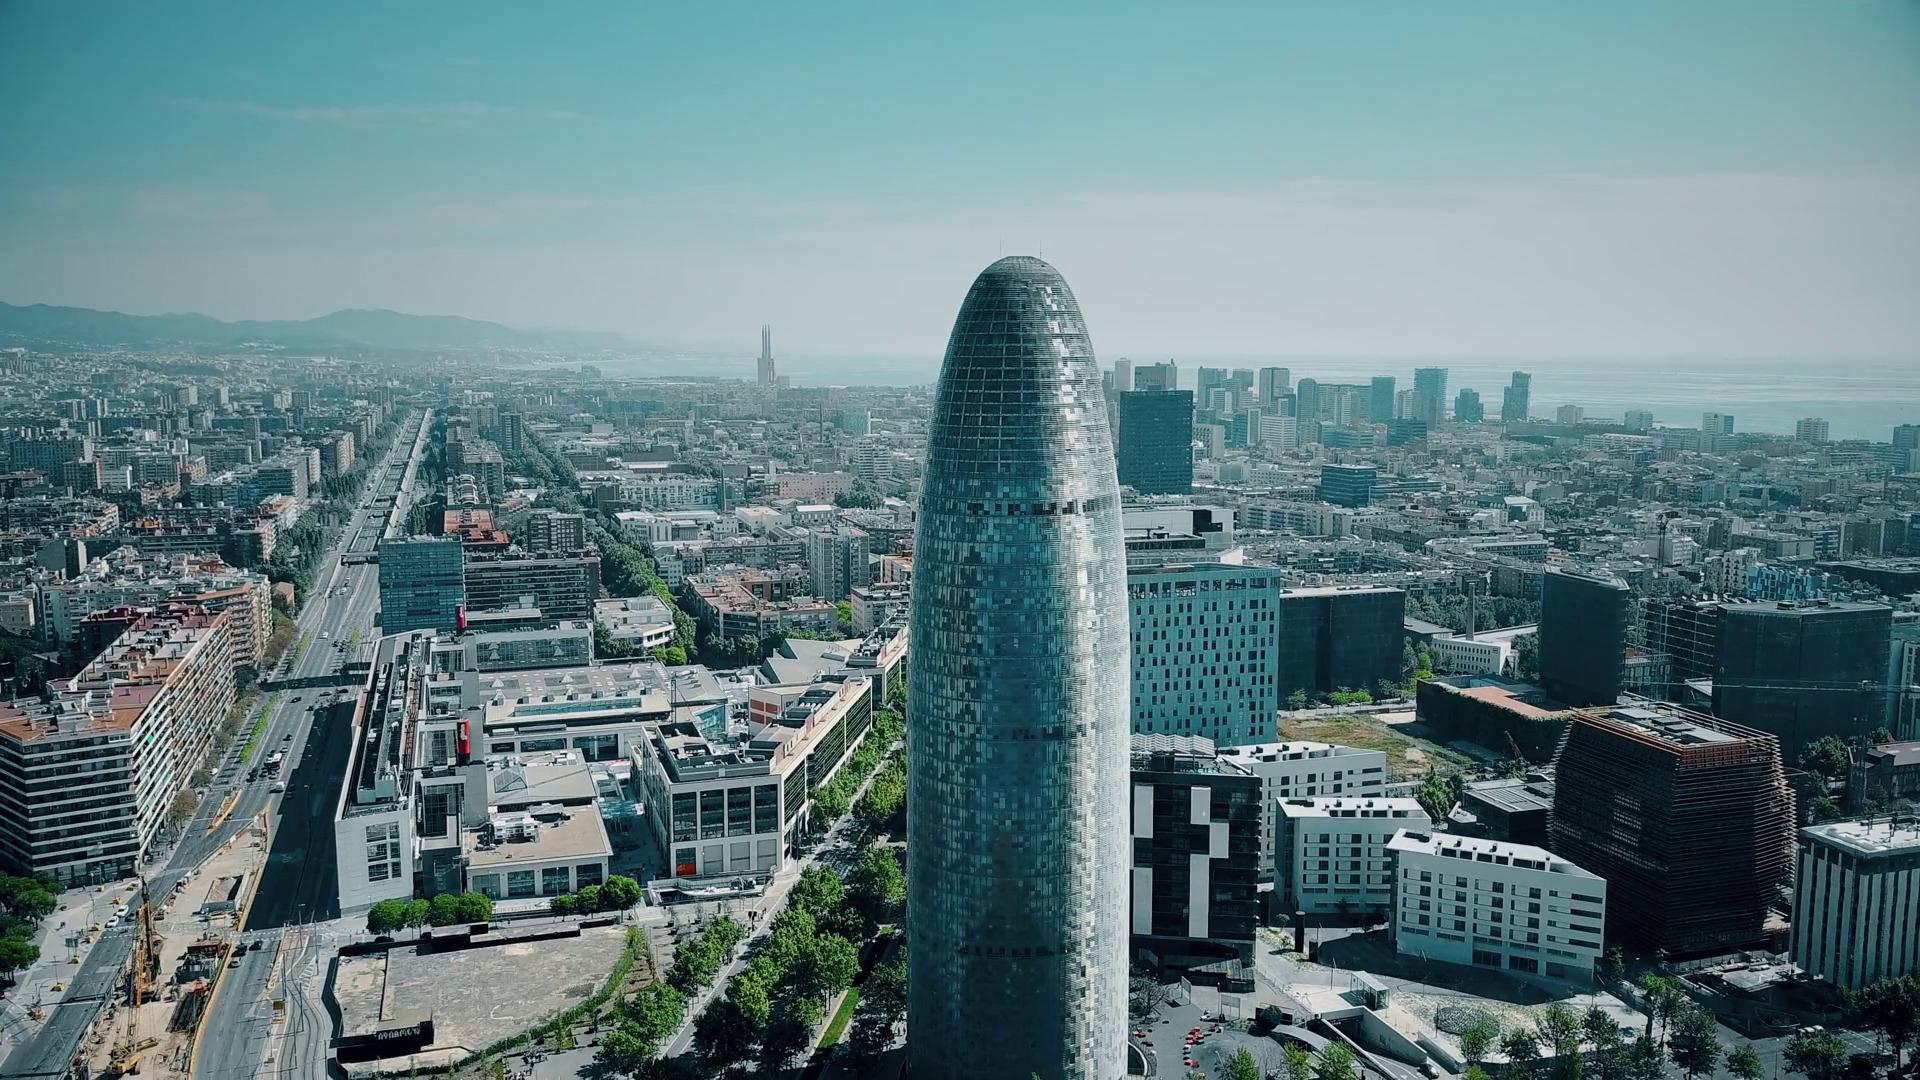 videoblocks barcelona spain april 15 2017 famous torre agbar skyscraper city and